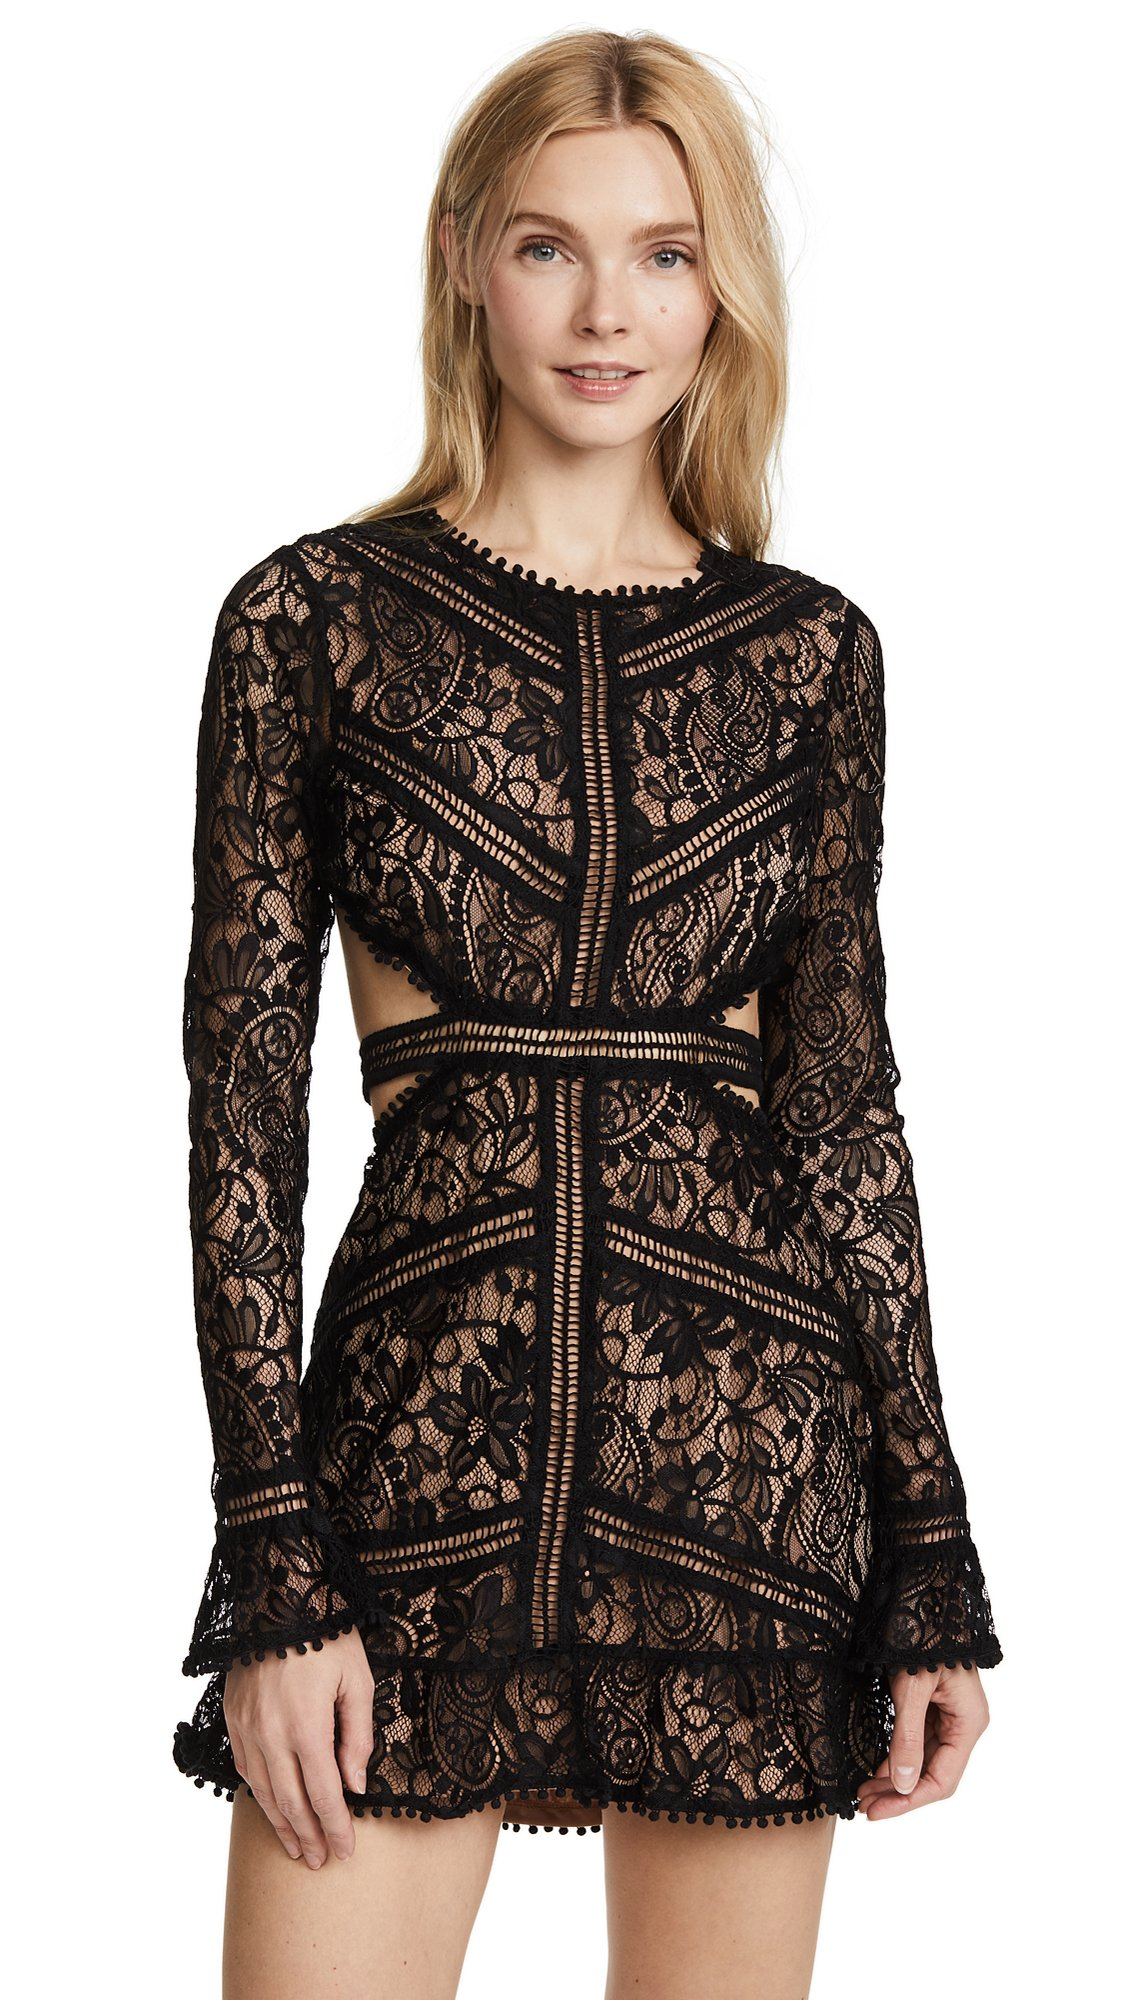 For Love & Lemons Women's Emerie Cut Out Dress, Black, XS